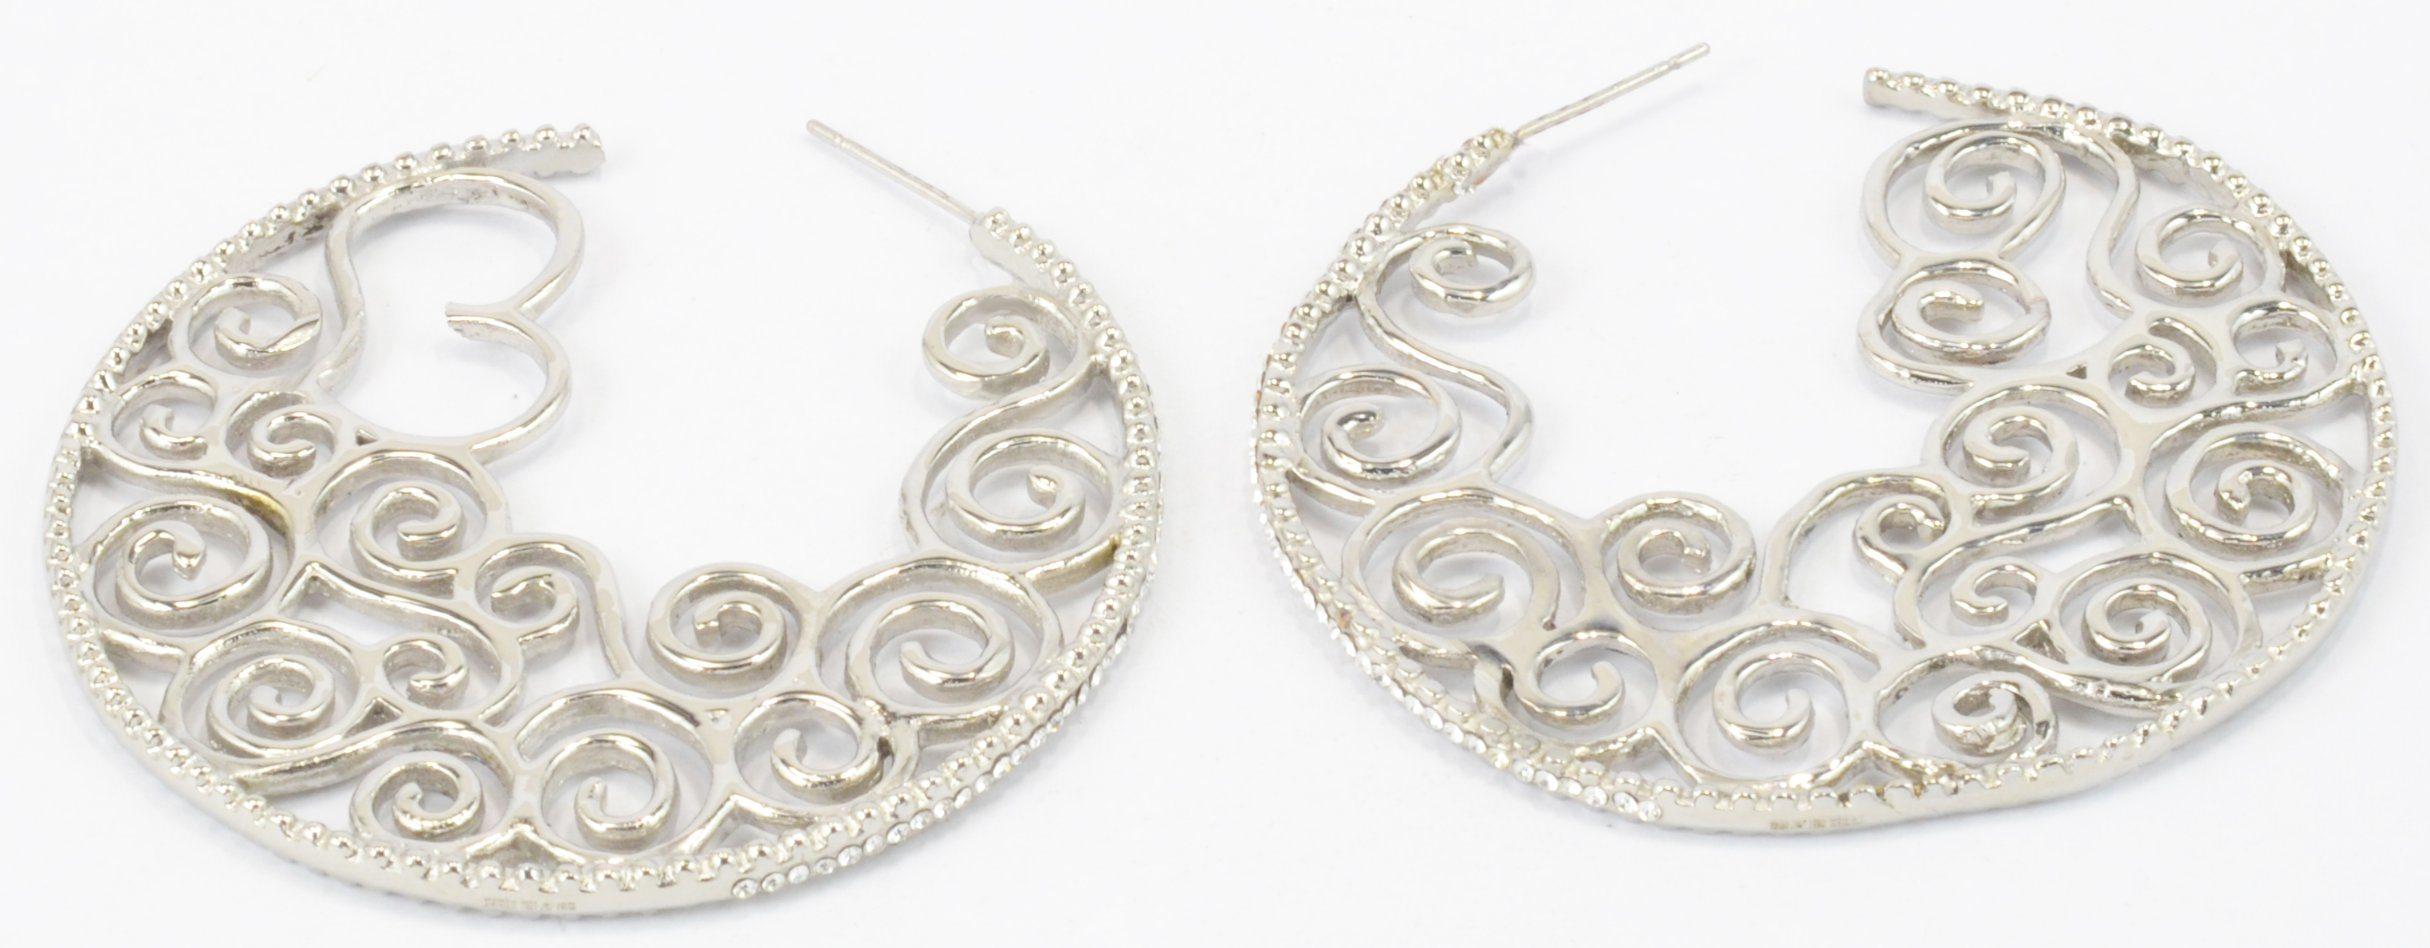 Big Hoop Earrings Stainless Steel Earrings for Young Women Fashion Jwelleries